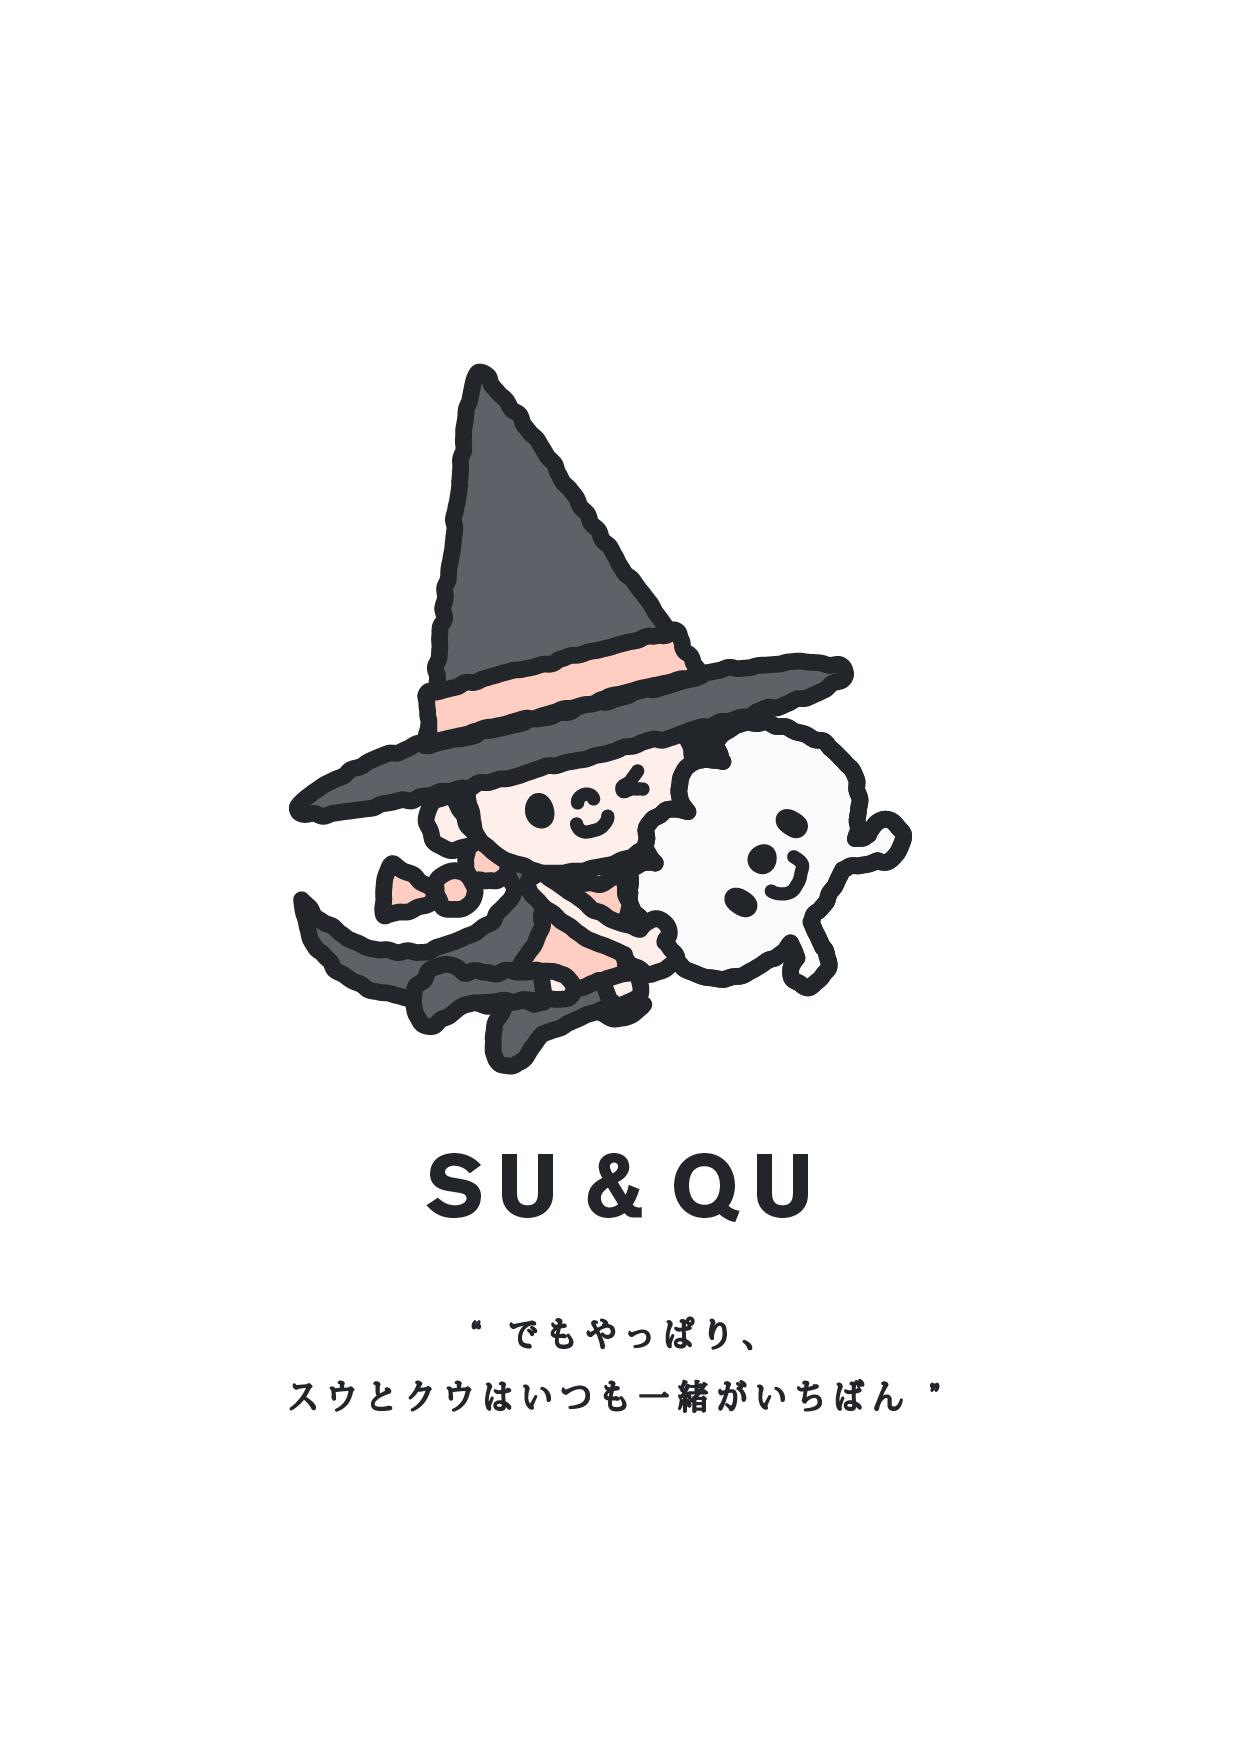 suqqu-present-DATA-09.png